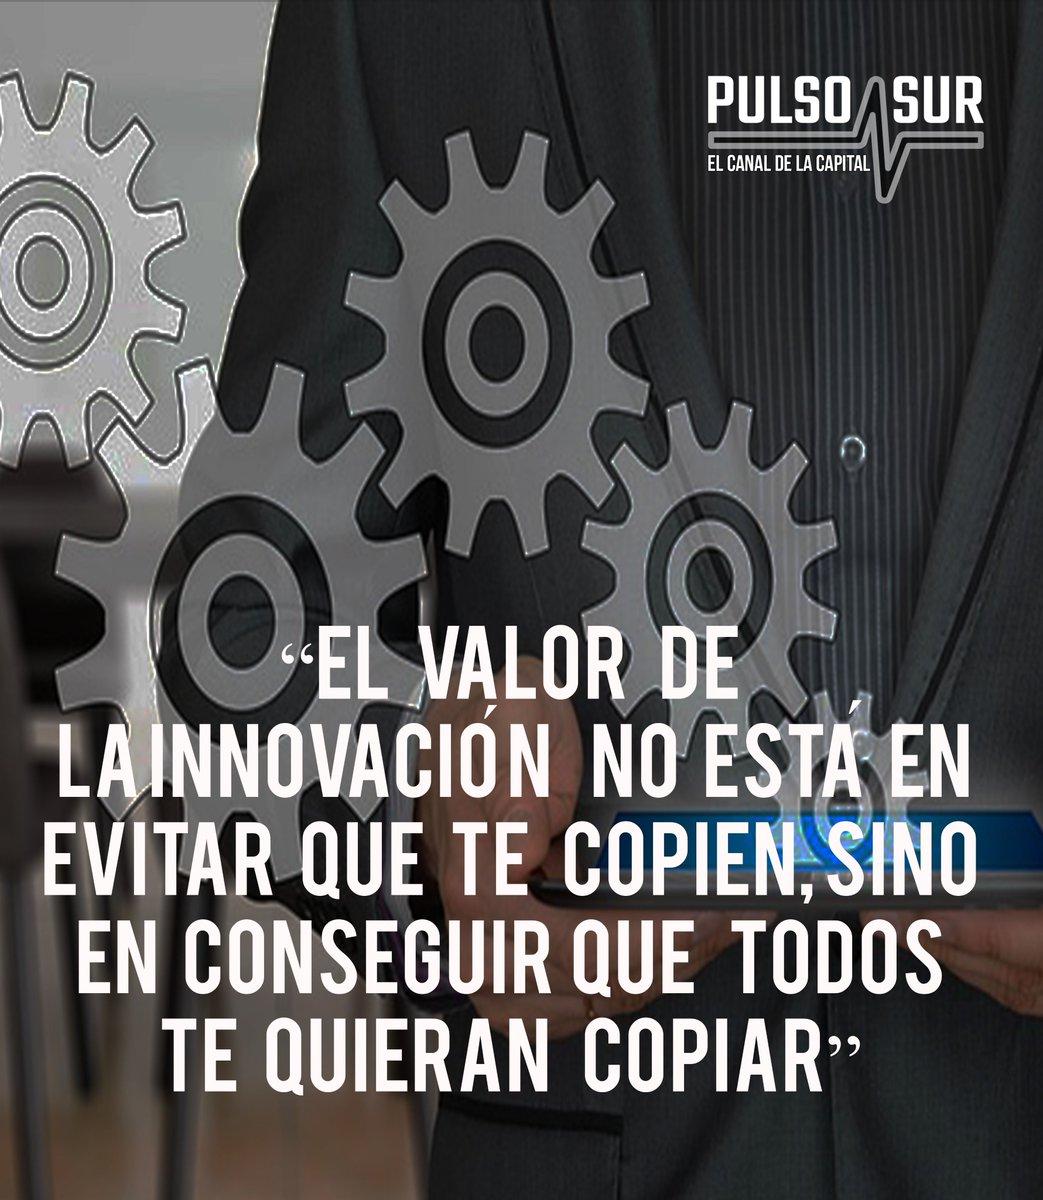 Pulso Sur Noticias's photo on Lunes 11